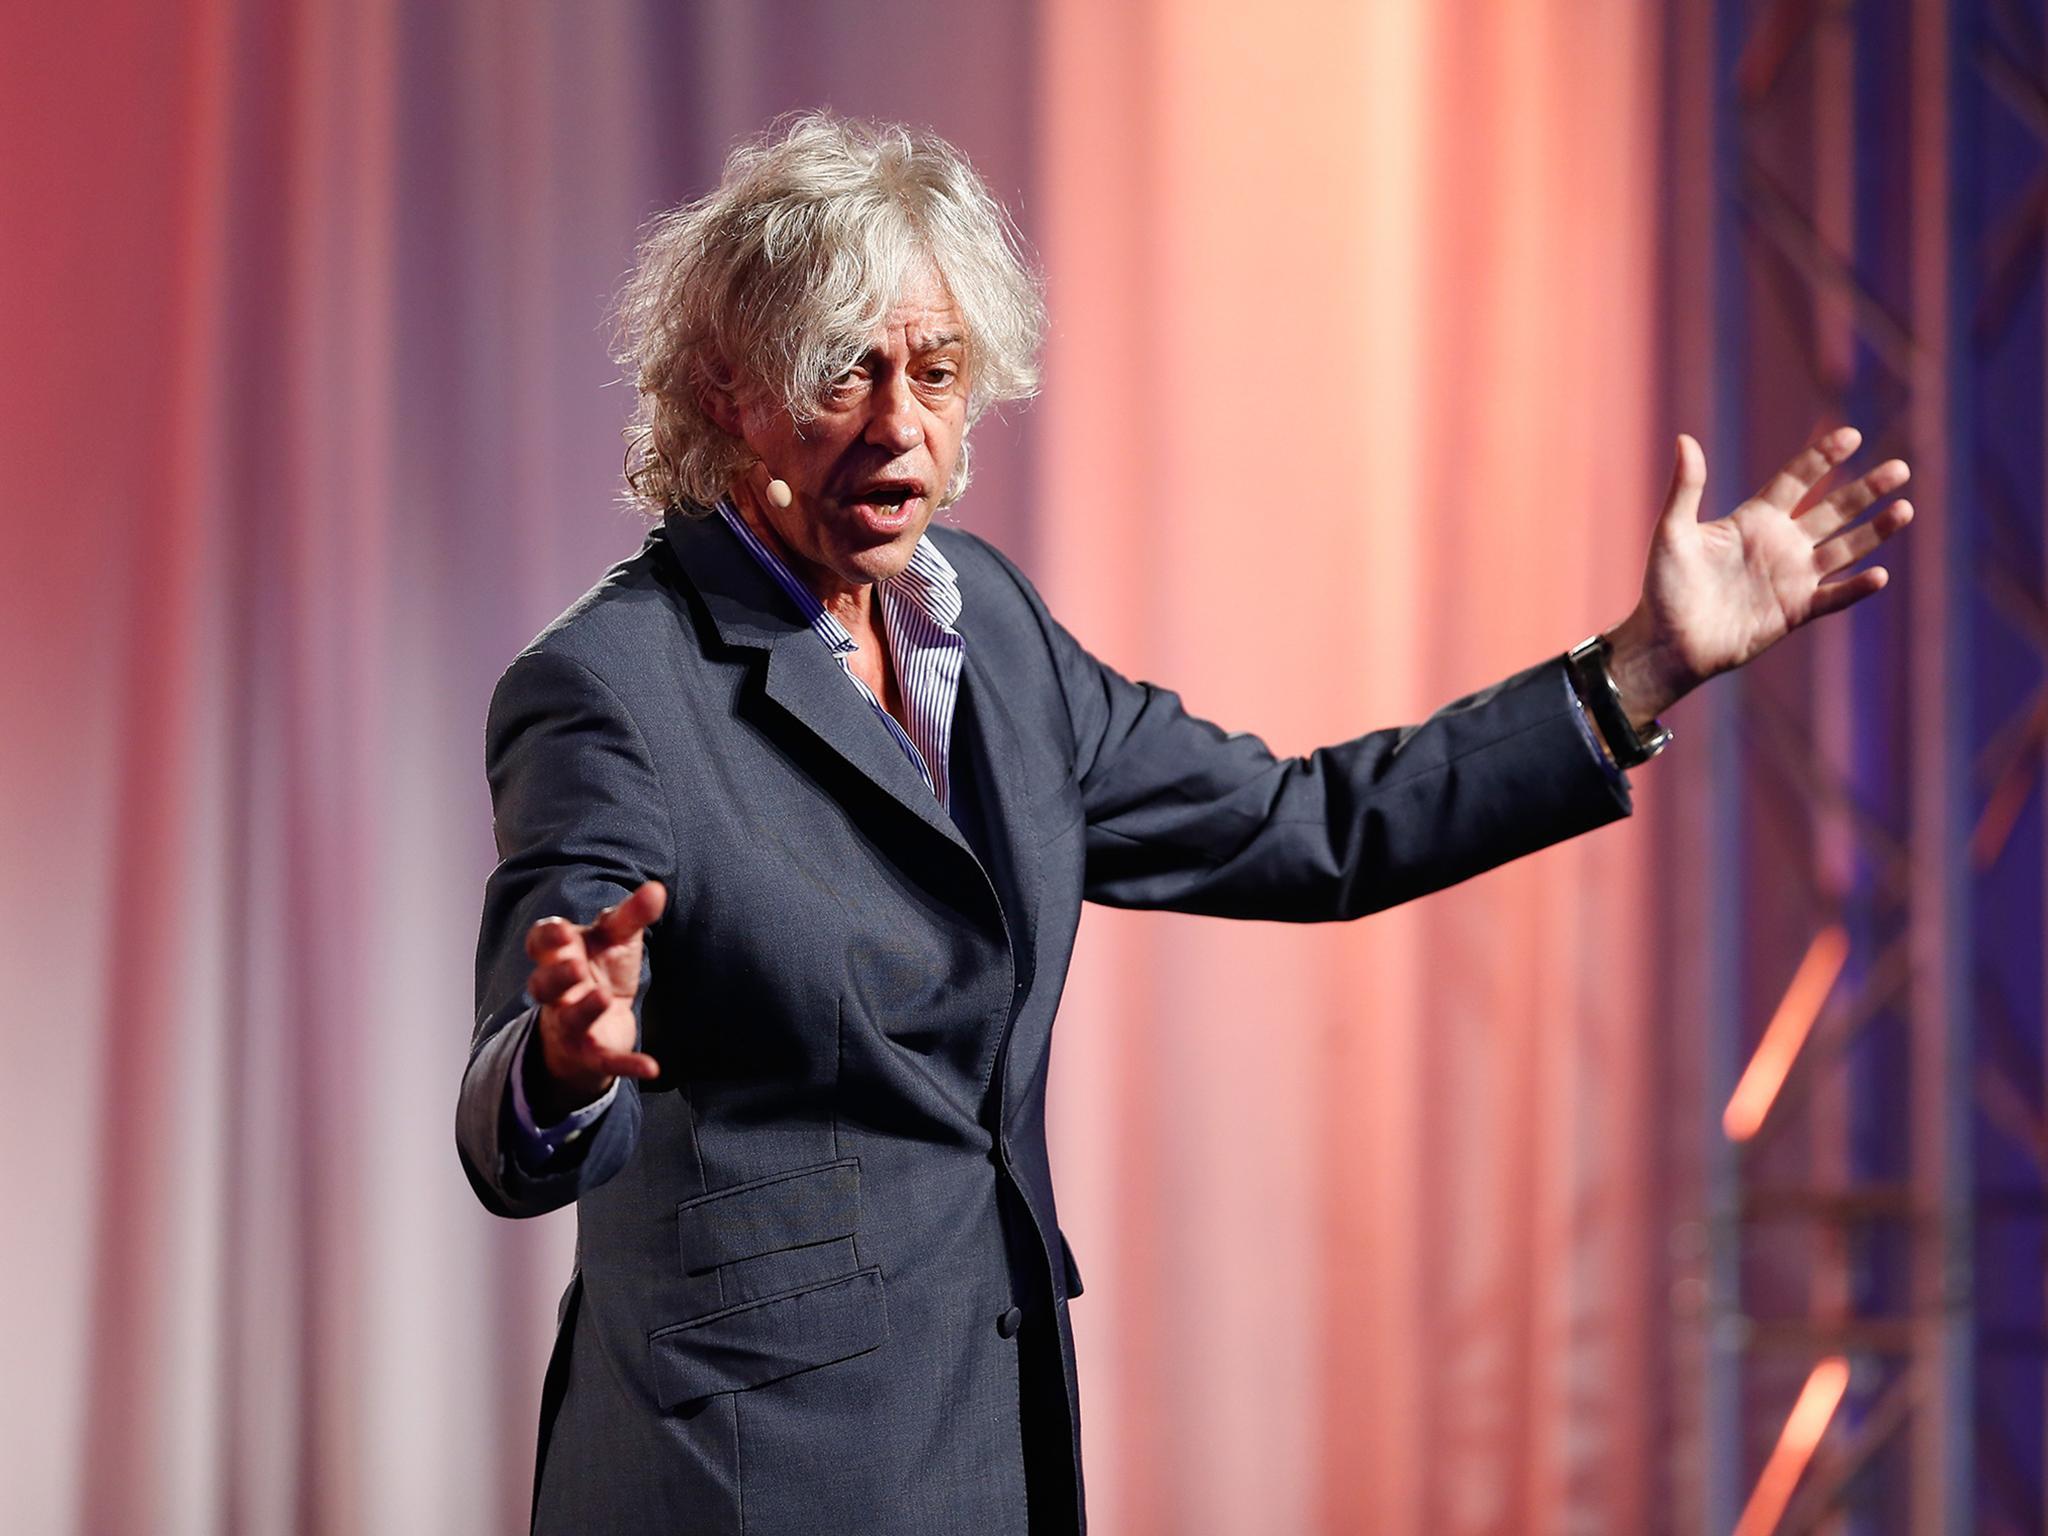 On Bob Geldof: